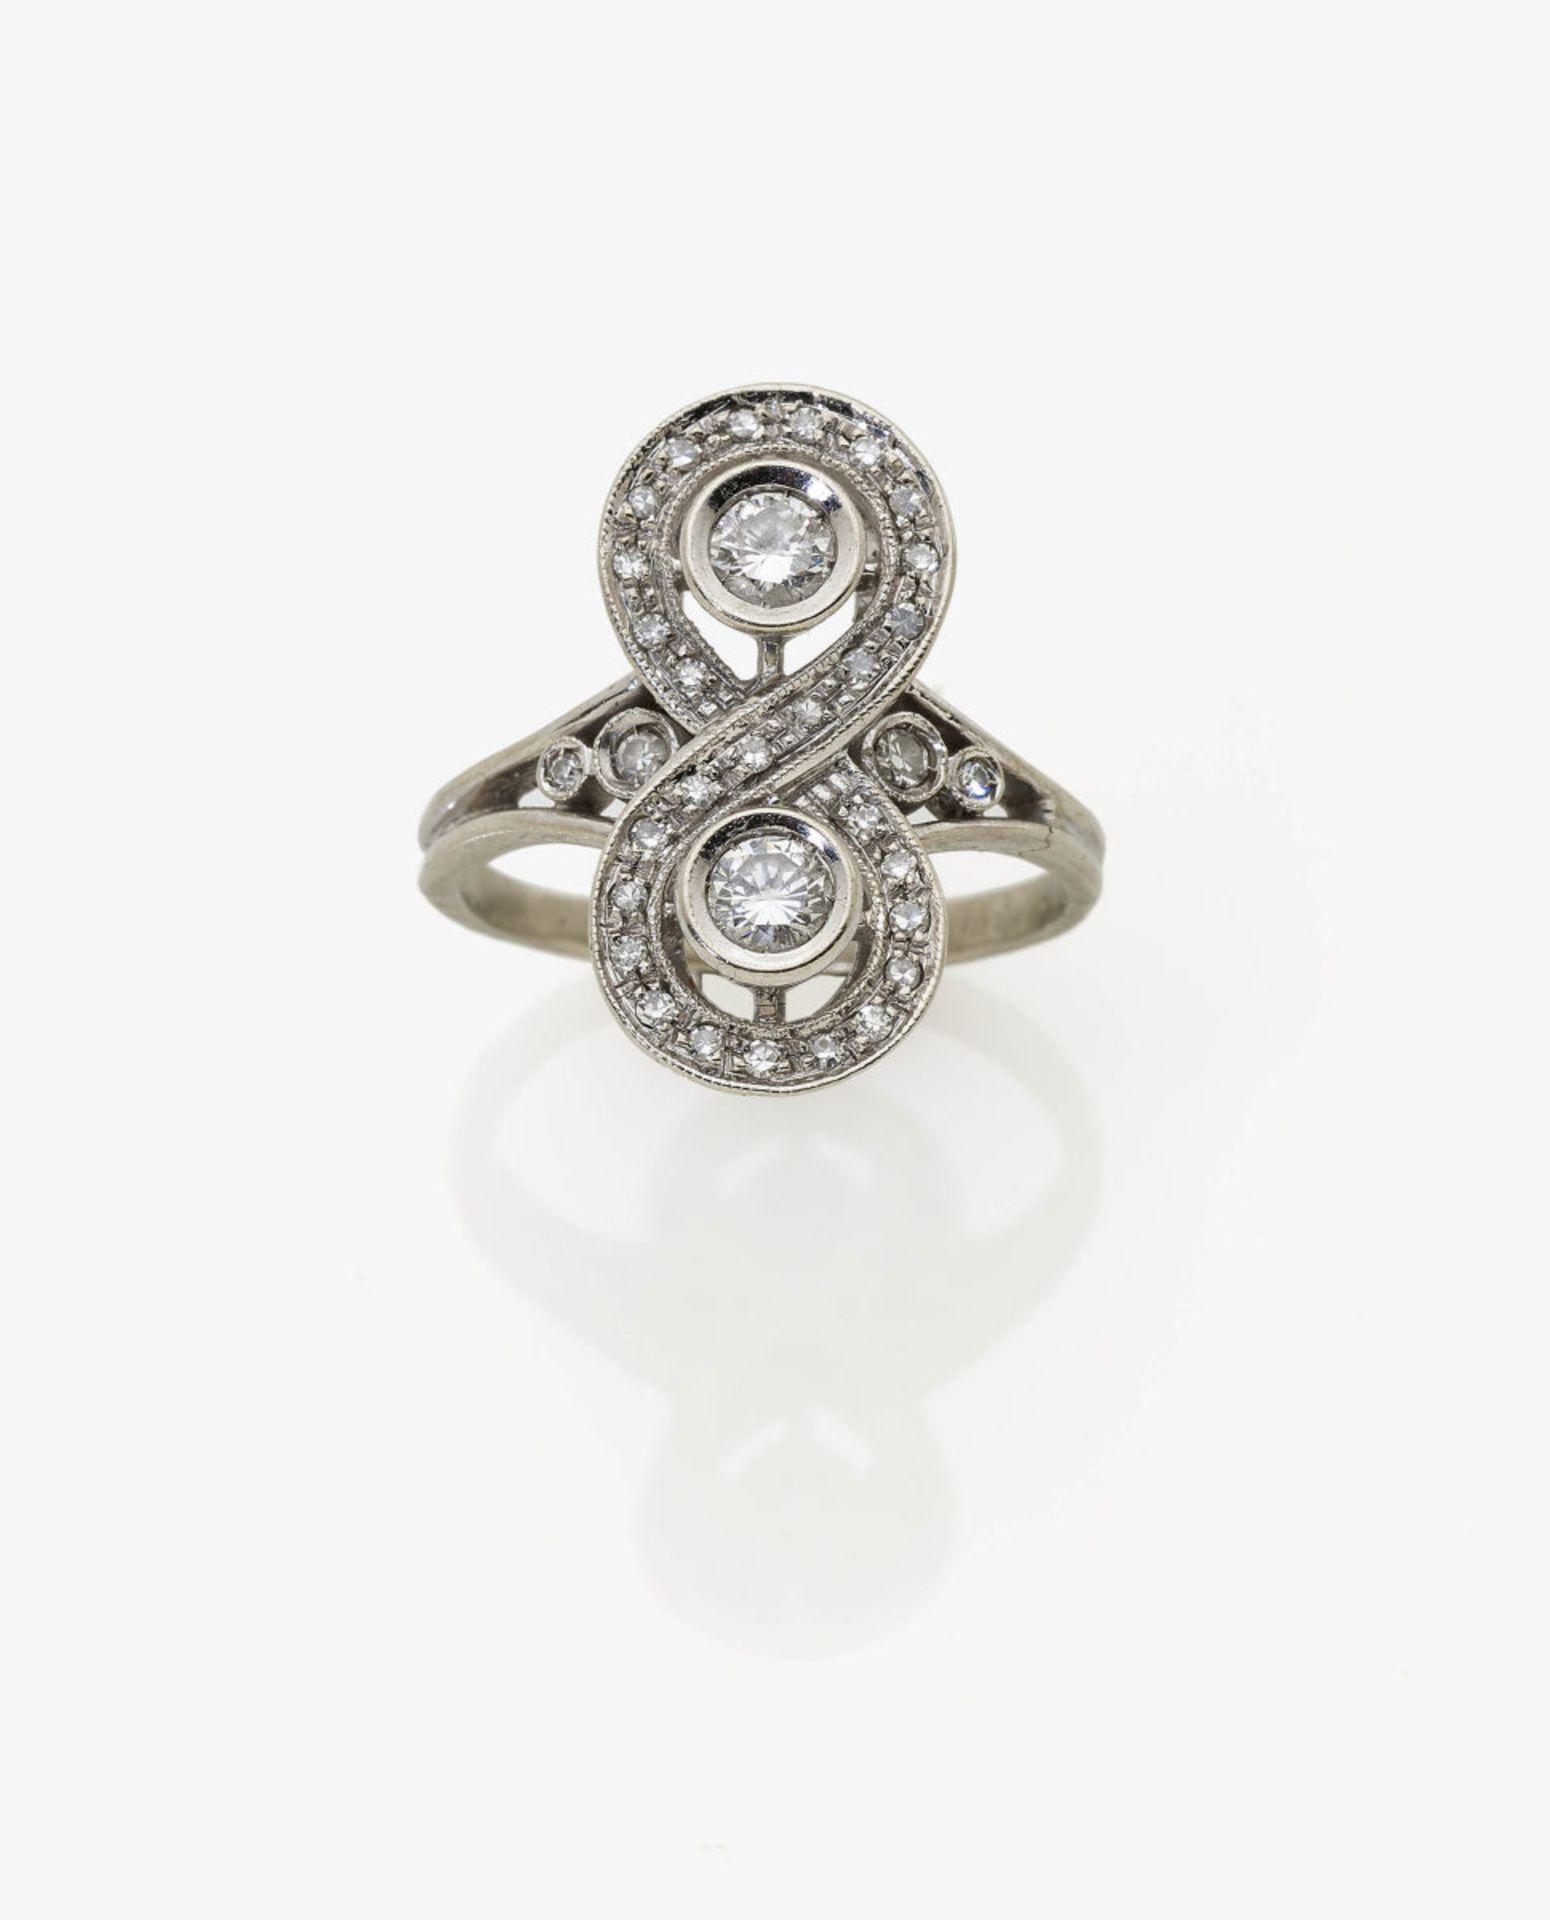 Los 1013 - A Diamond Ring